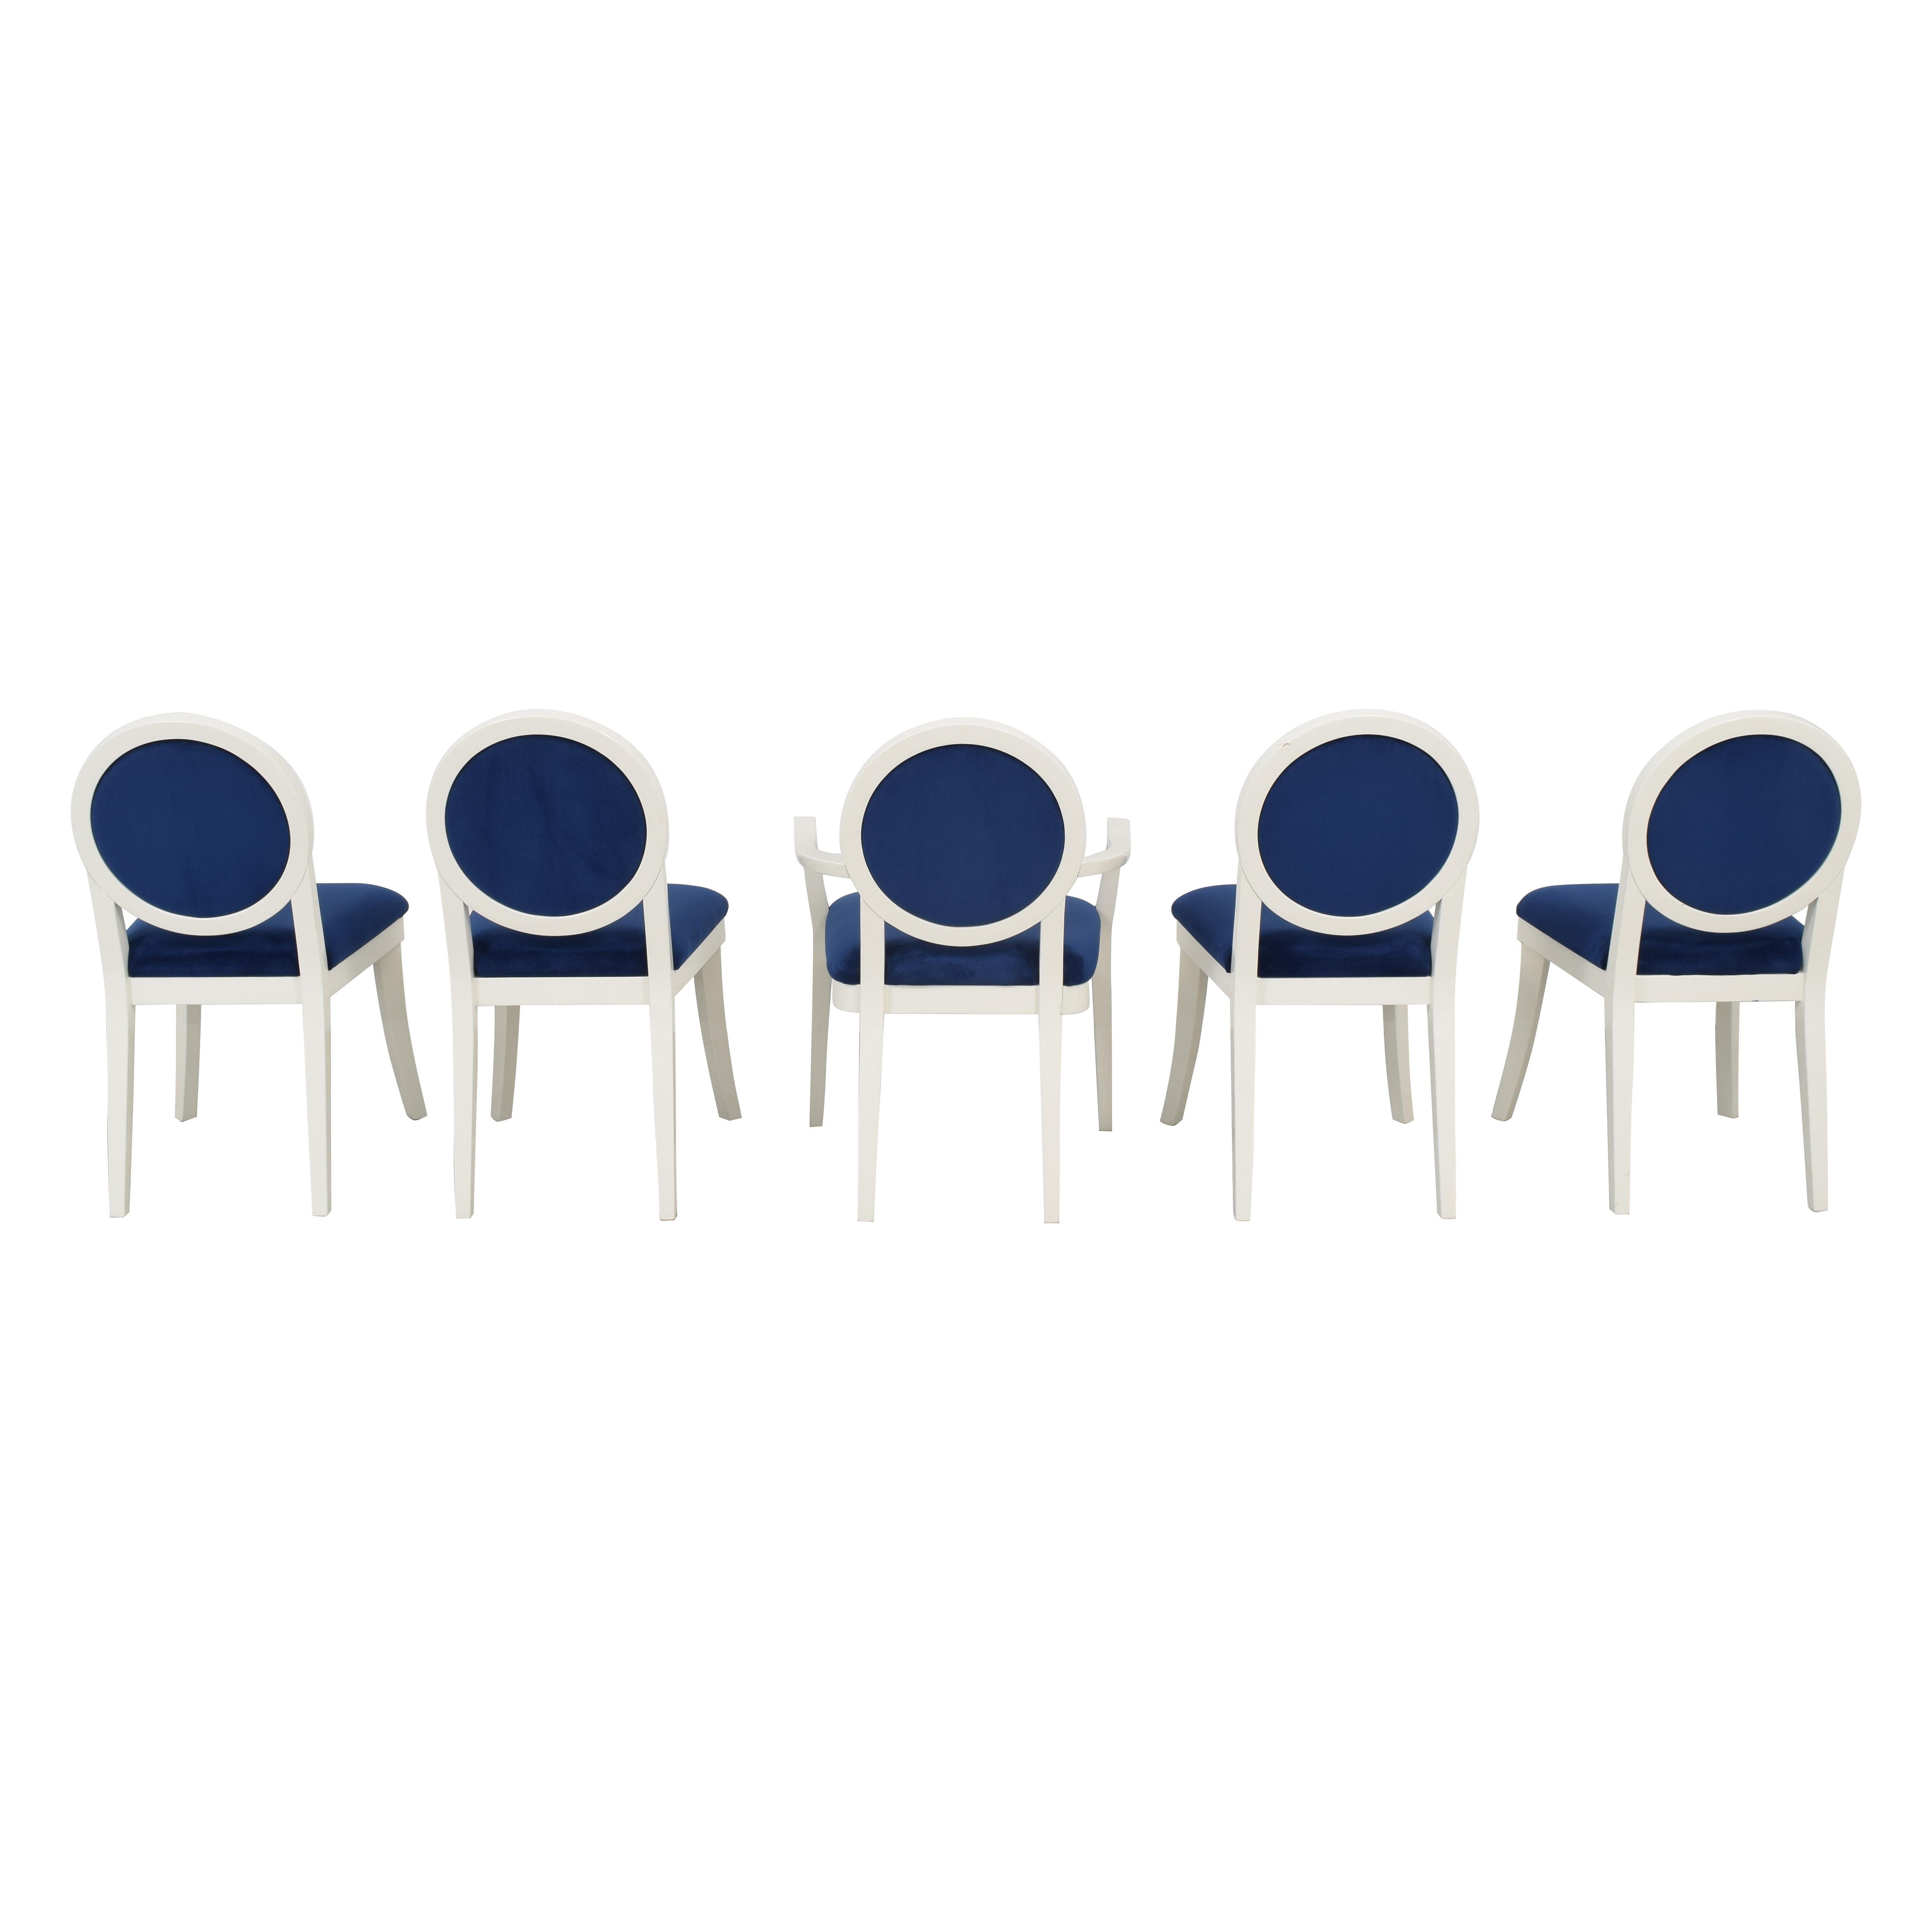 Jonathan Adler Jonathan Adler Happy Chic Dining Chairs Chairs